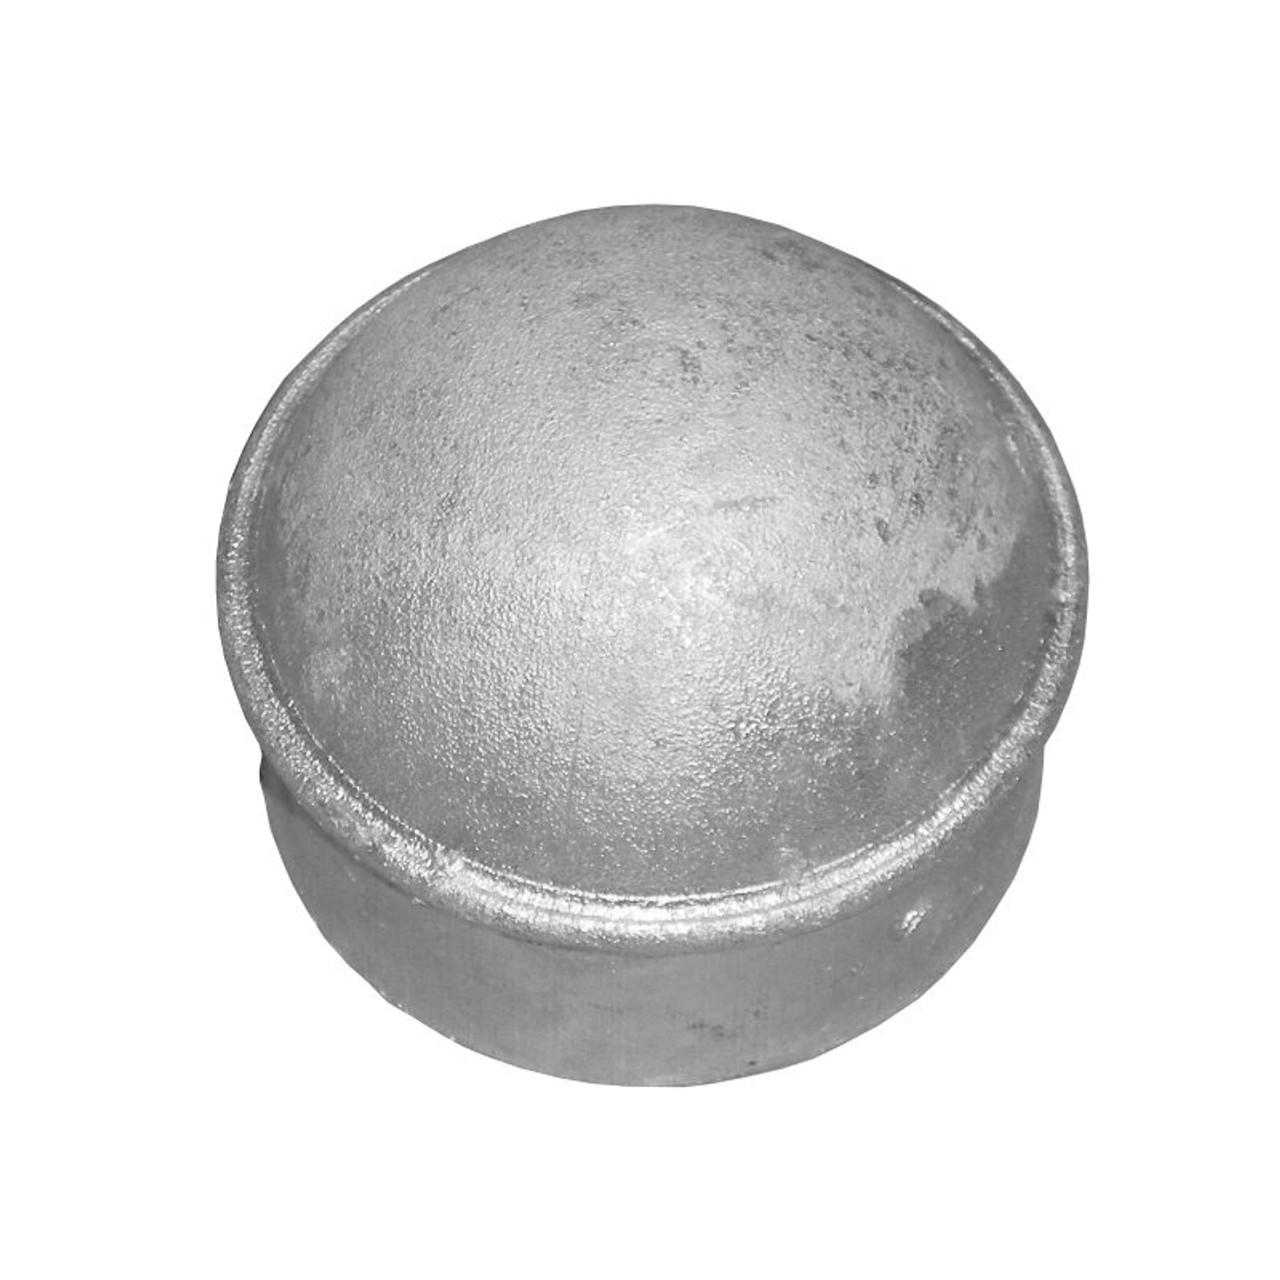 "Heavy Duty Steel Fence Loop Cap 2-3//8/"" x 1-5//8/"""